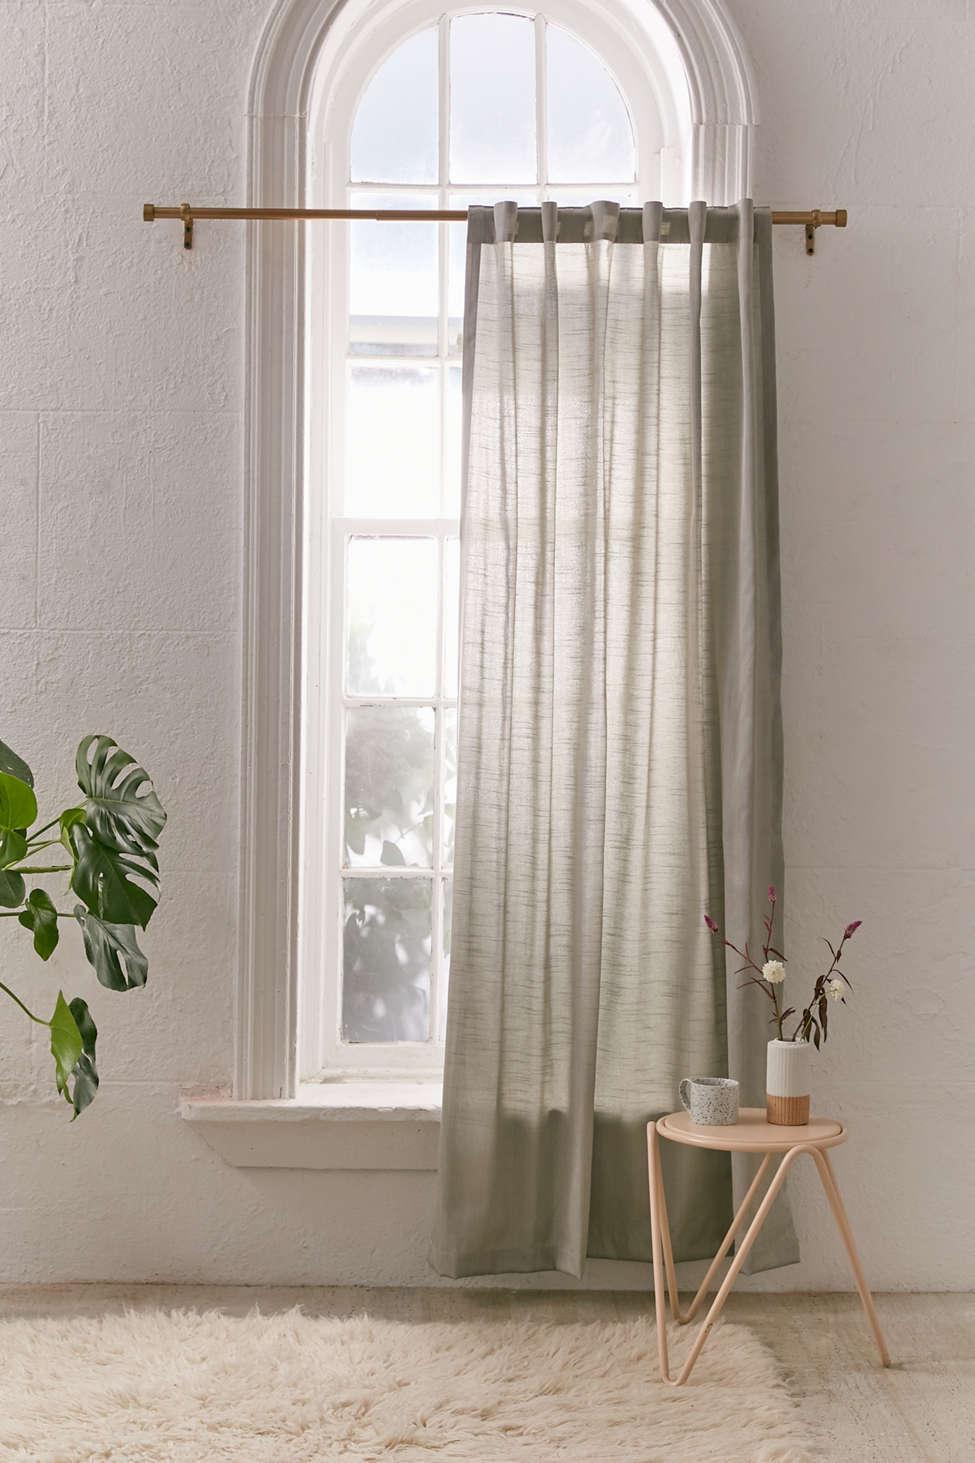 Slide View: 1: Metallic Sheen Blackout Window Curtain